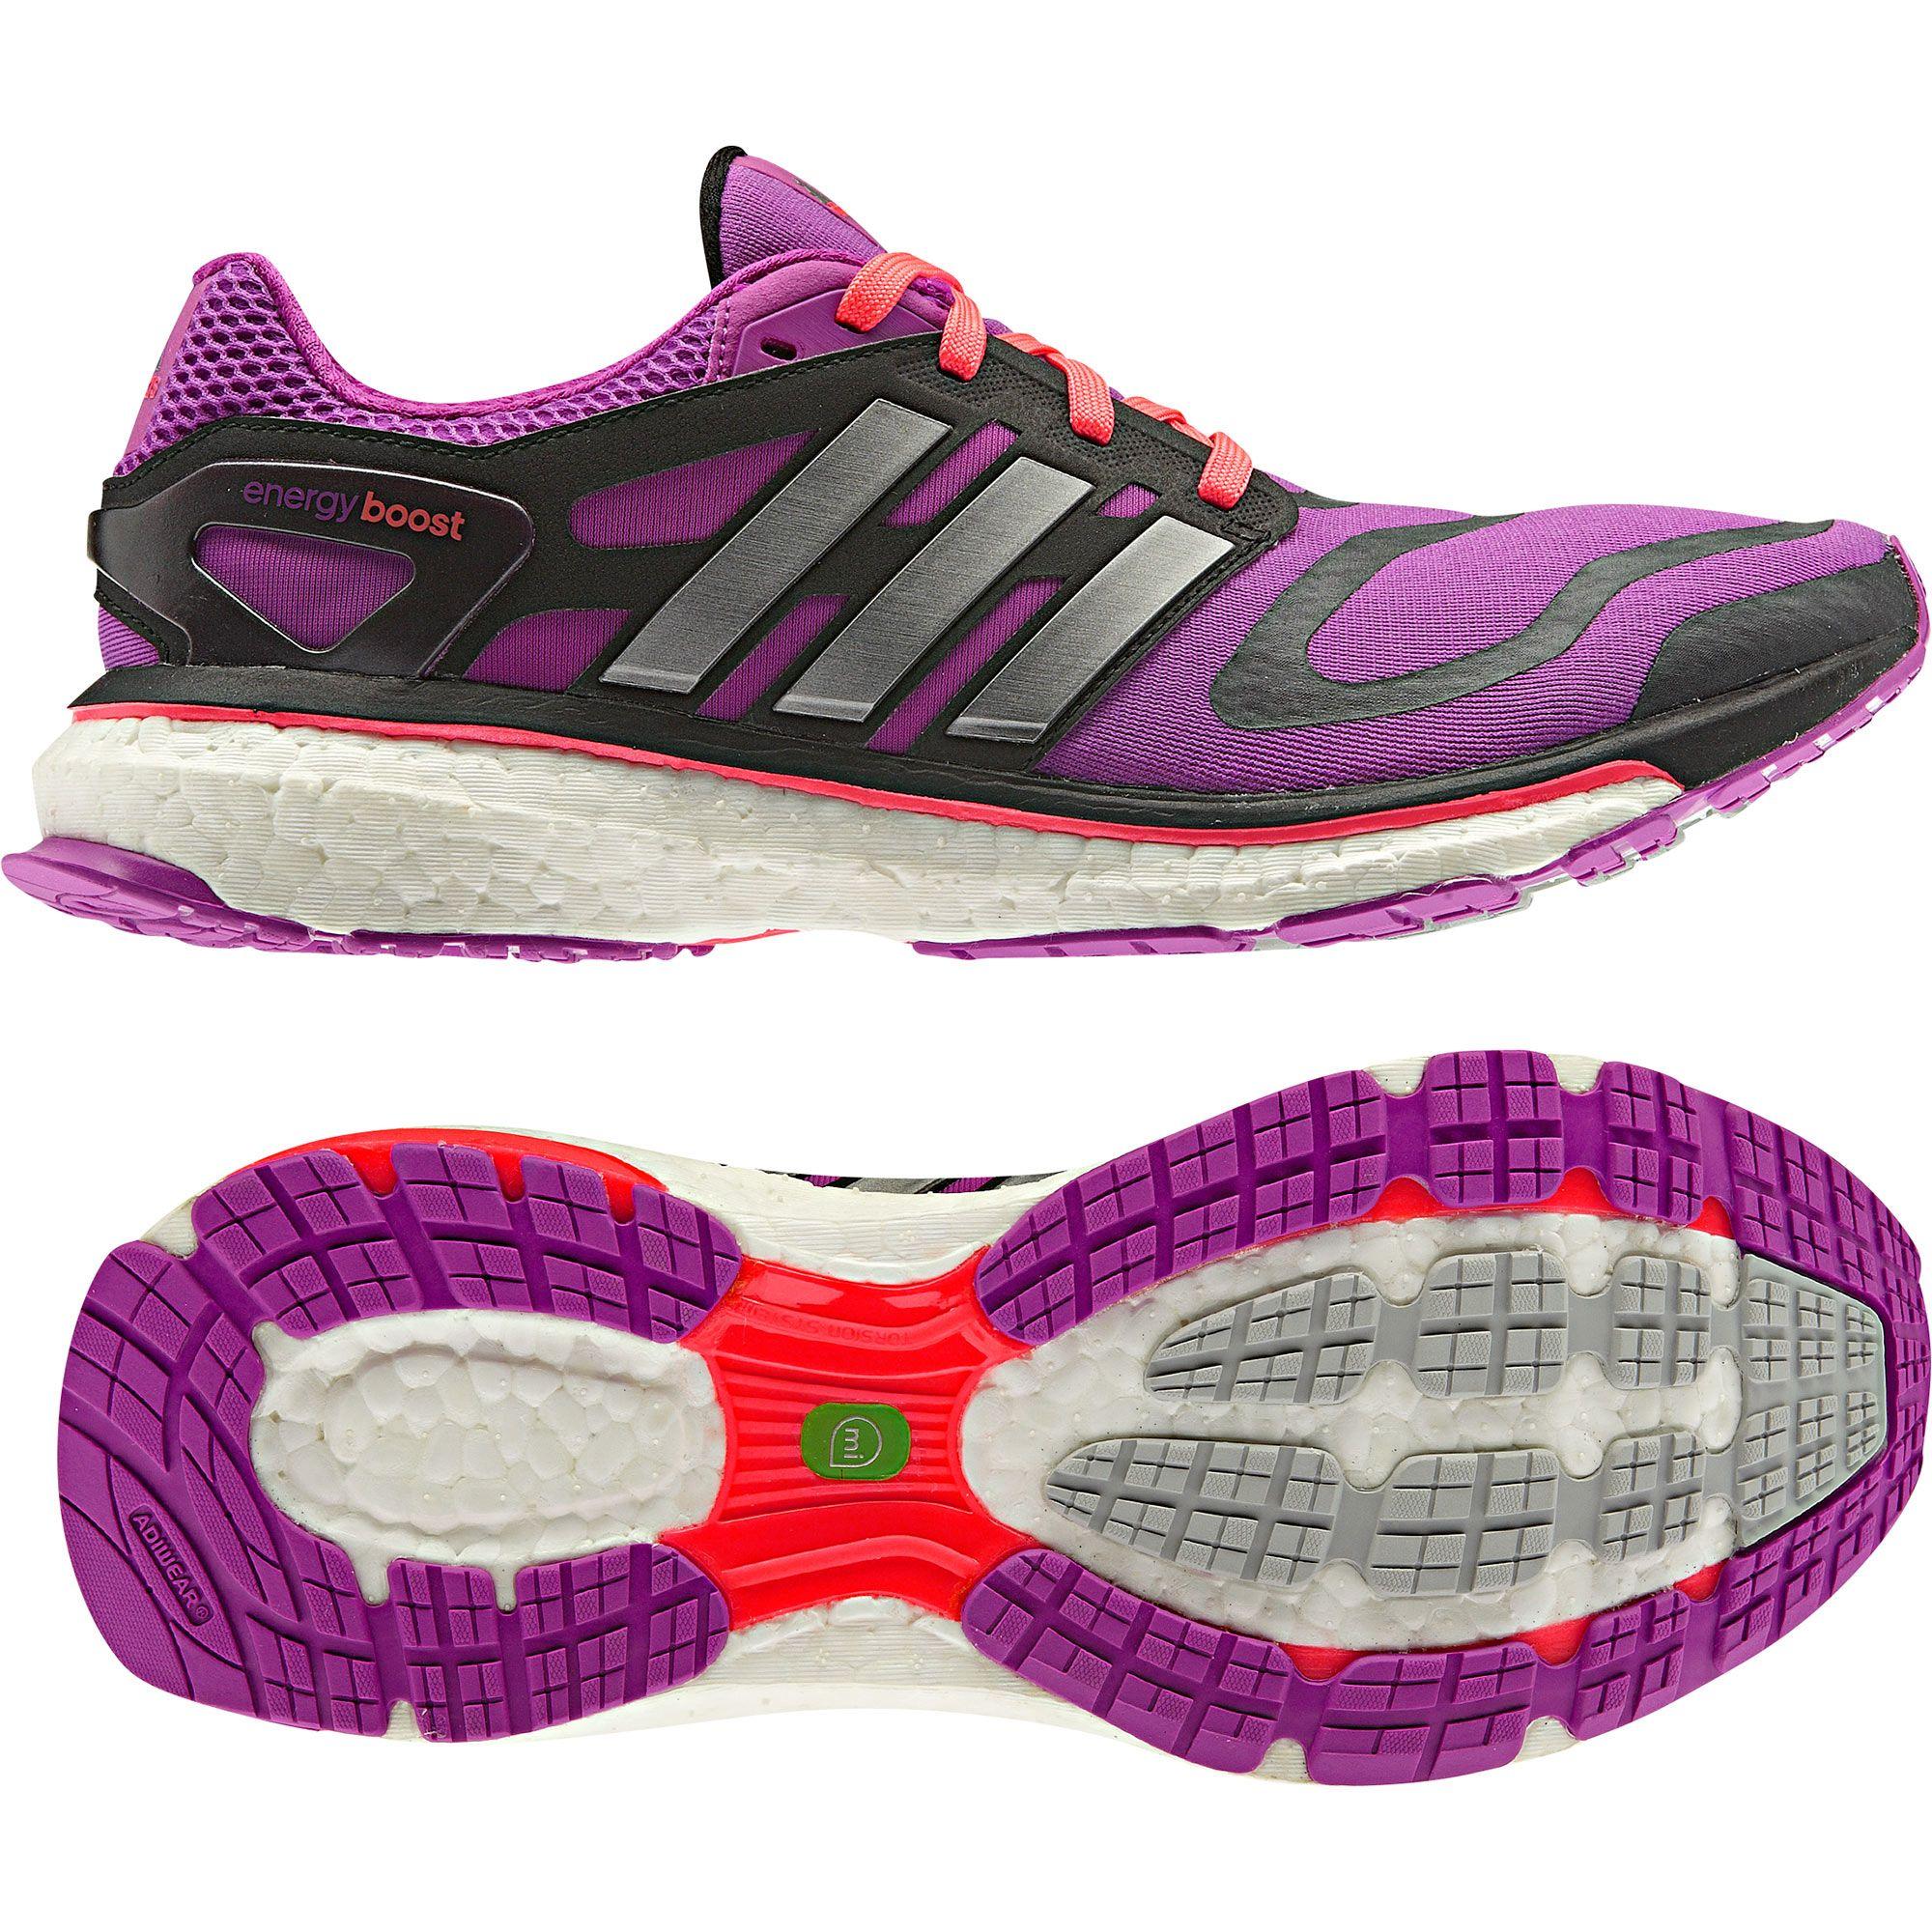 Womens Energy Boost Shoes 15c0a1e3dc